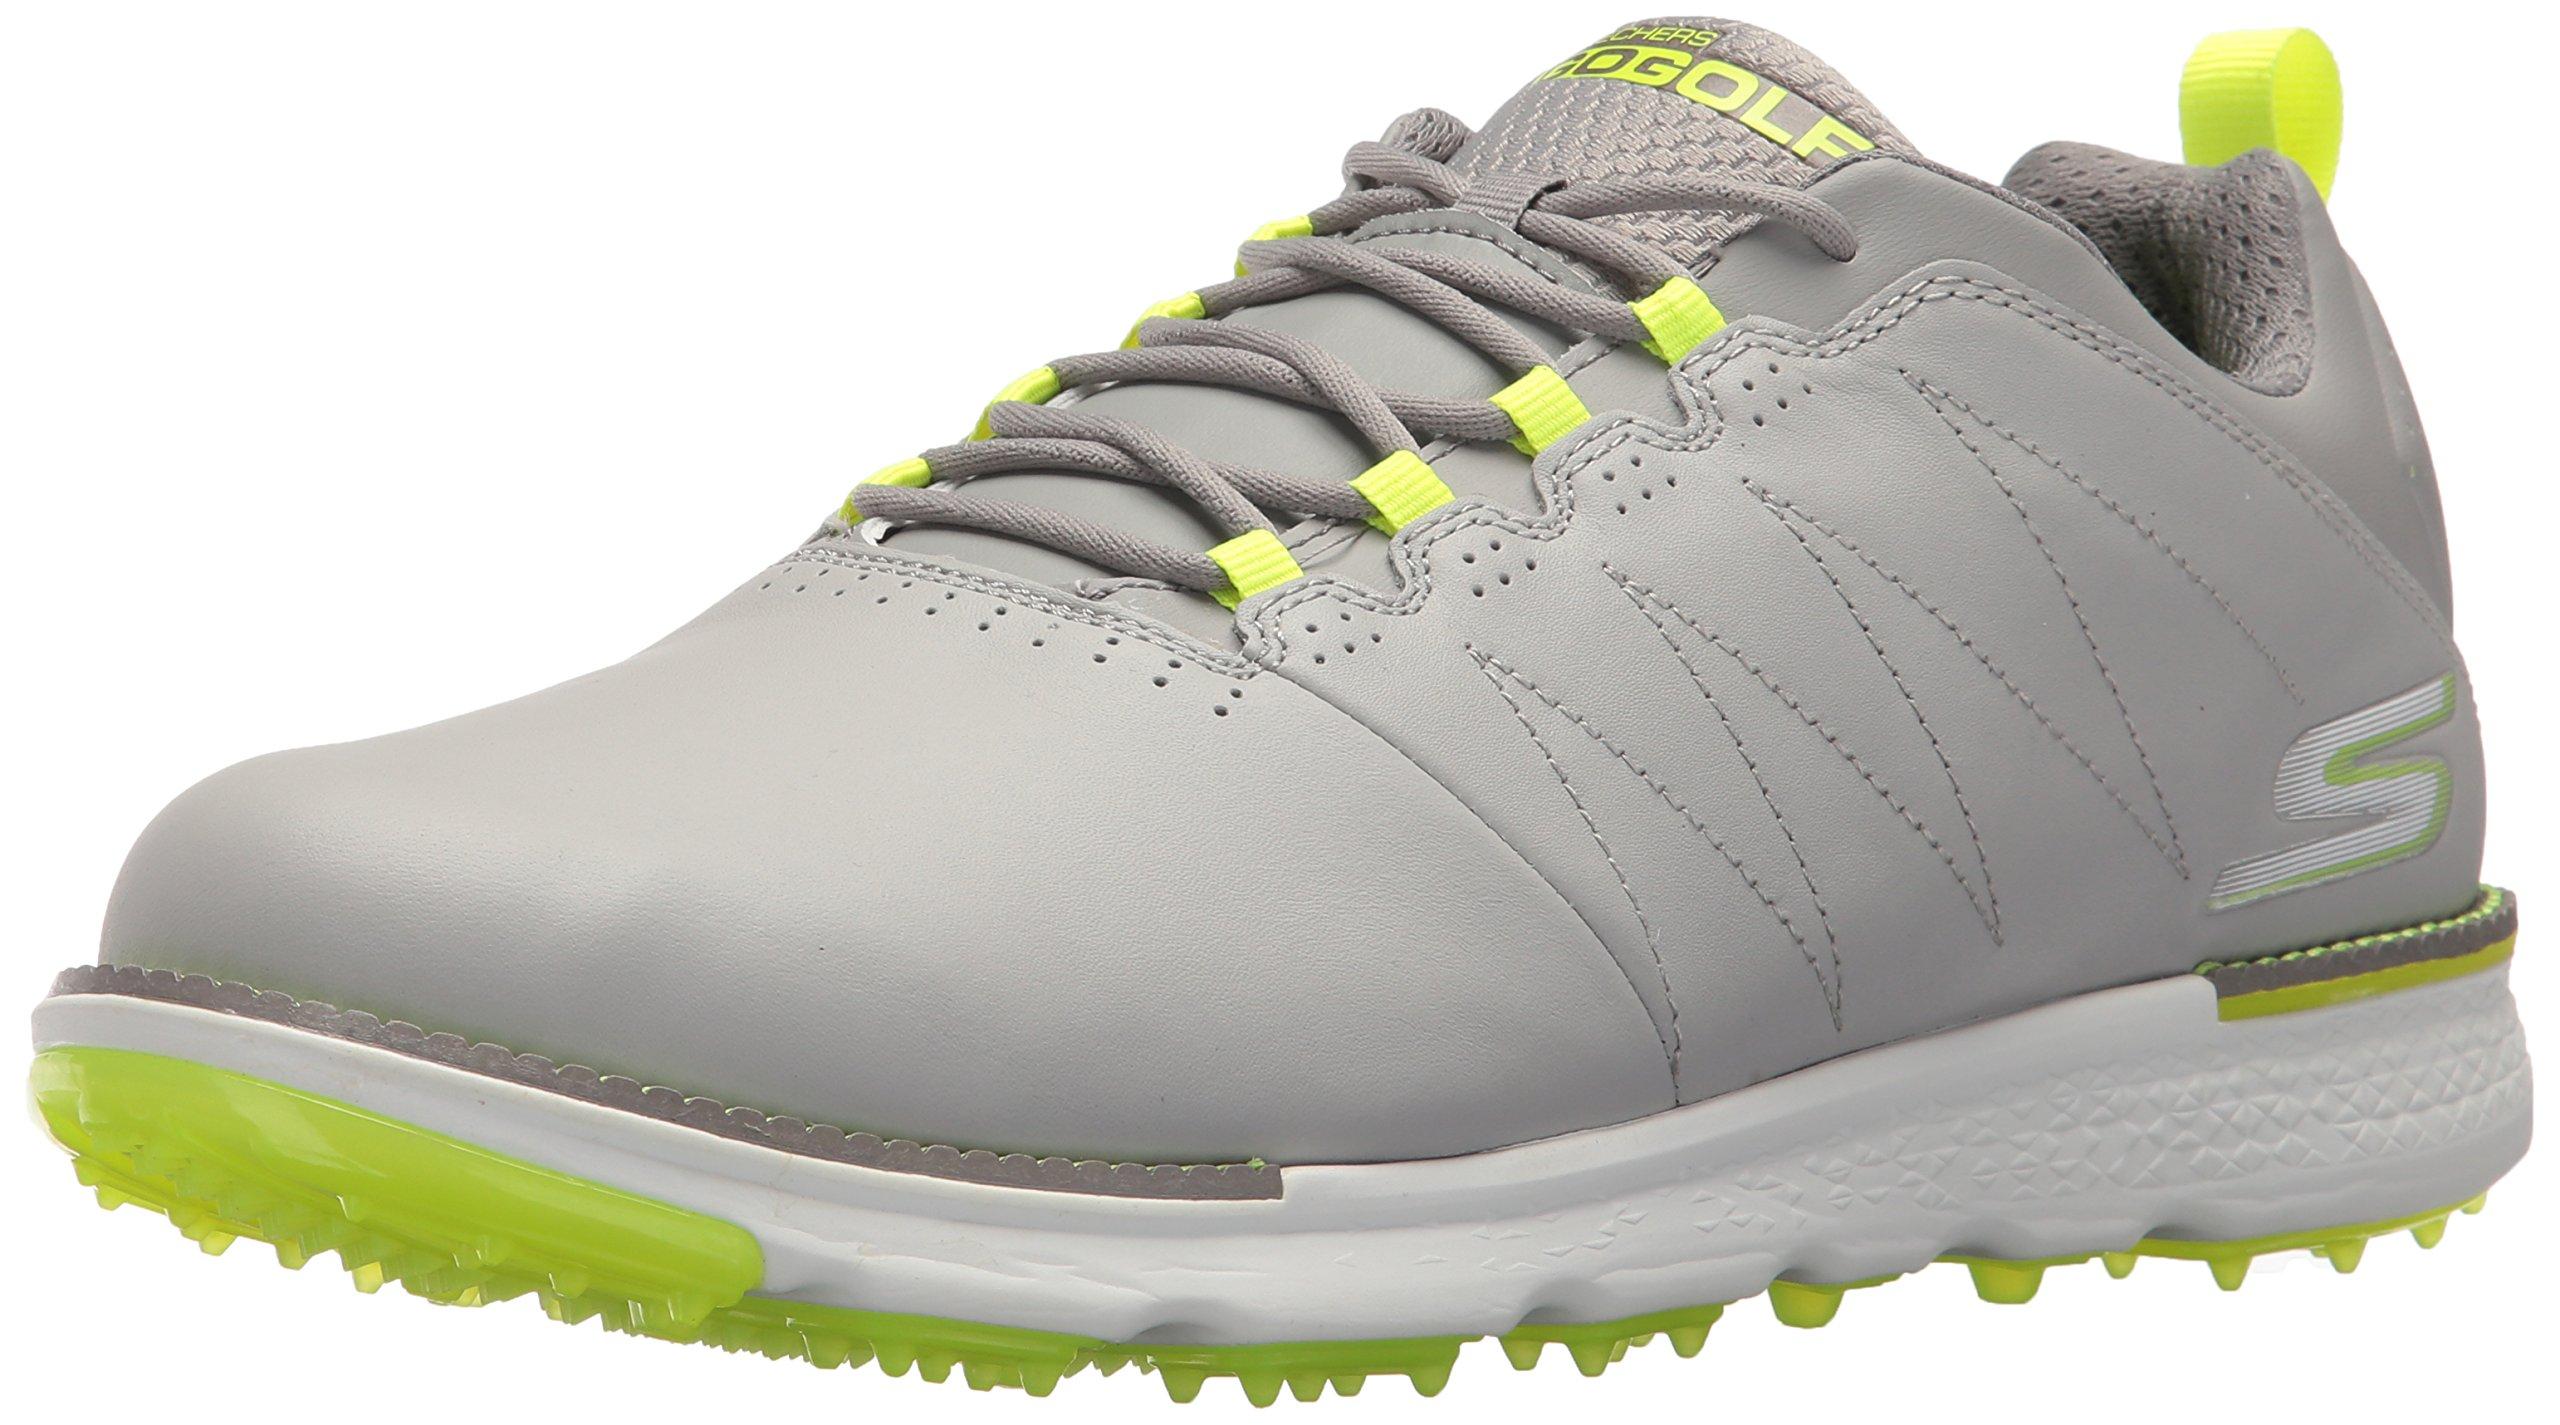 Skechers Men's Go Elite 3 Golf-Shoes,gray/lime,7.5 M US